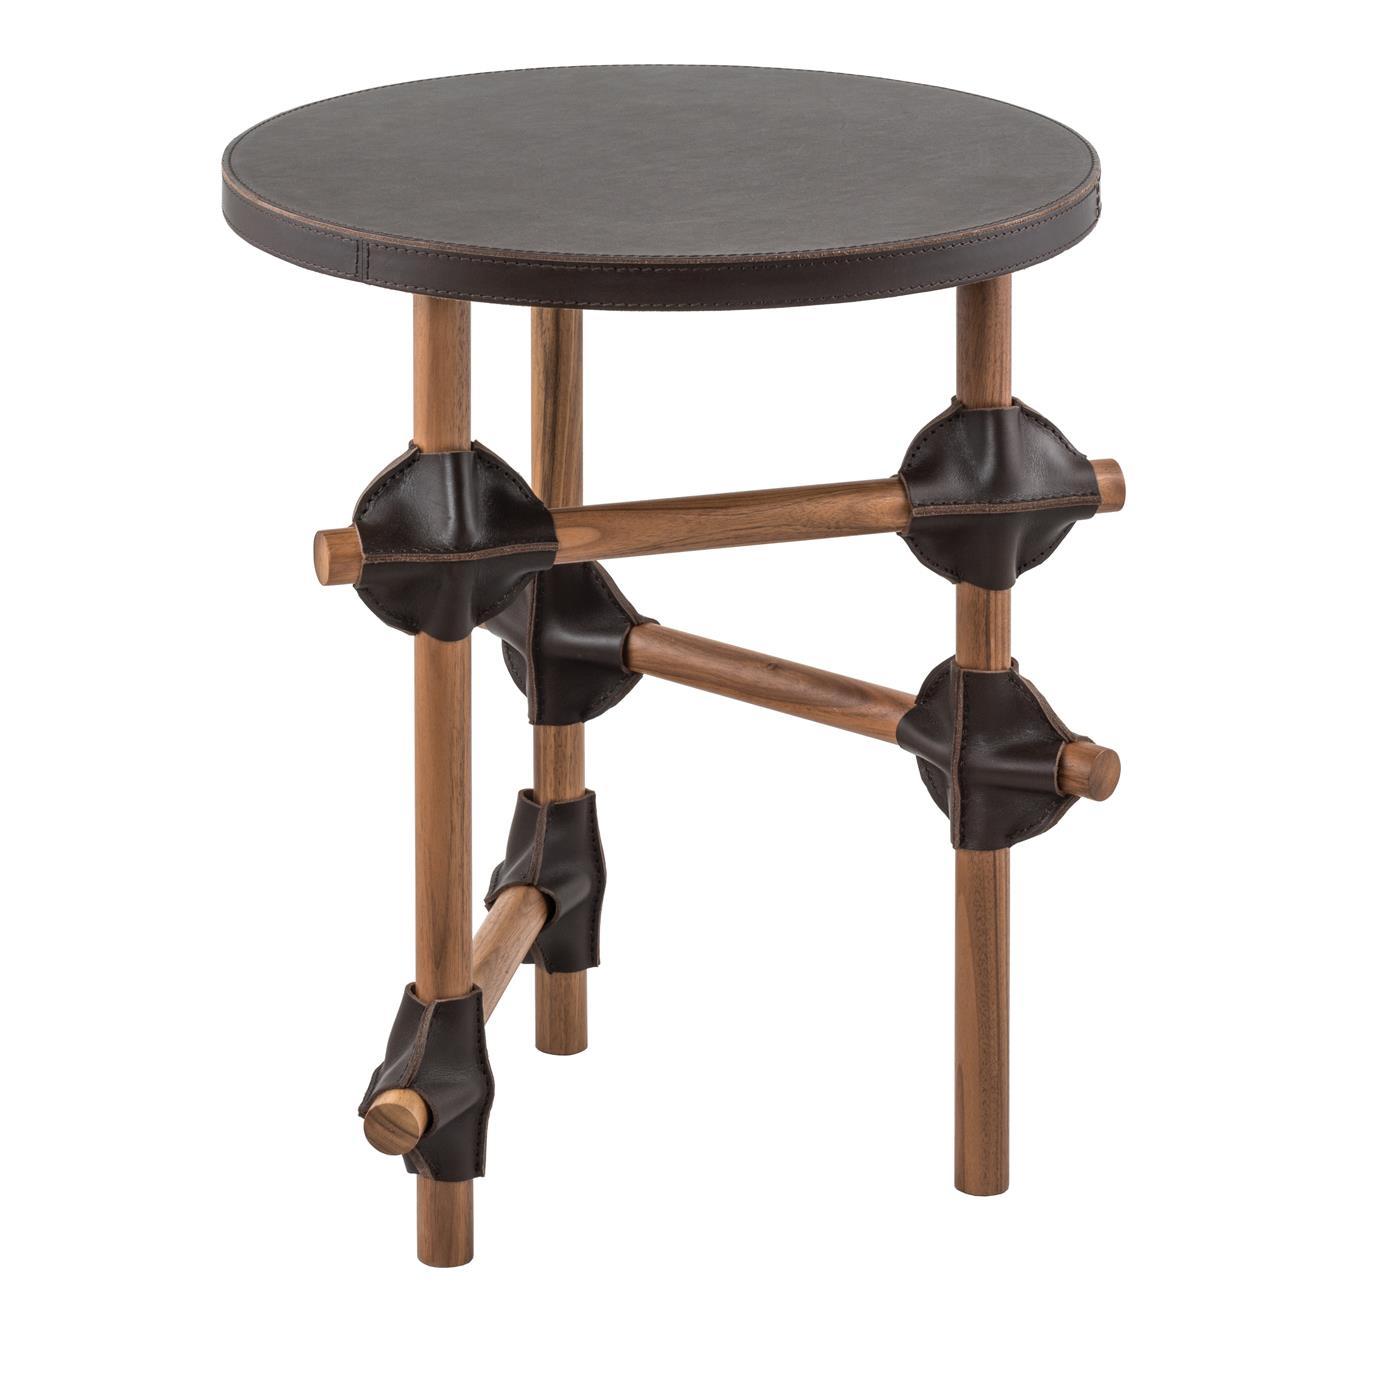 GIOBAGNARA/BARRAGE slimテーブル